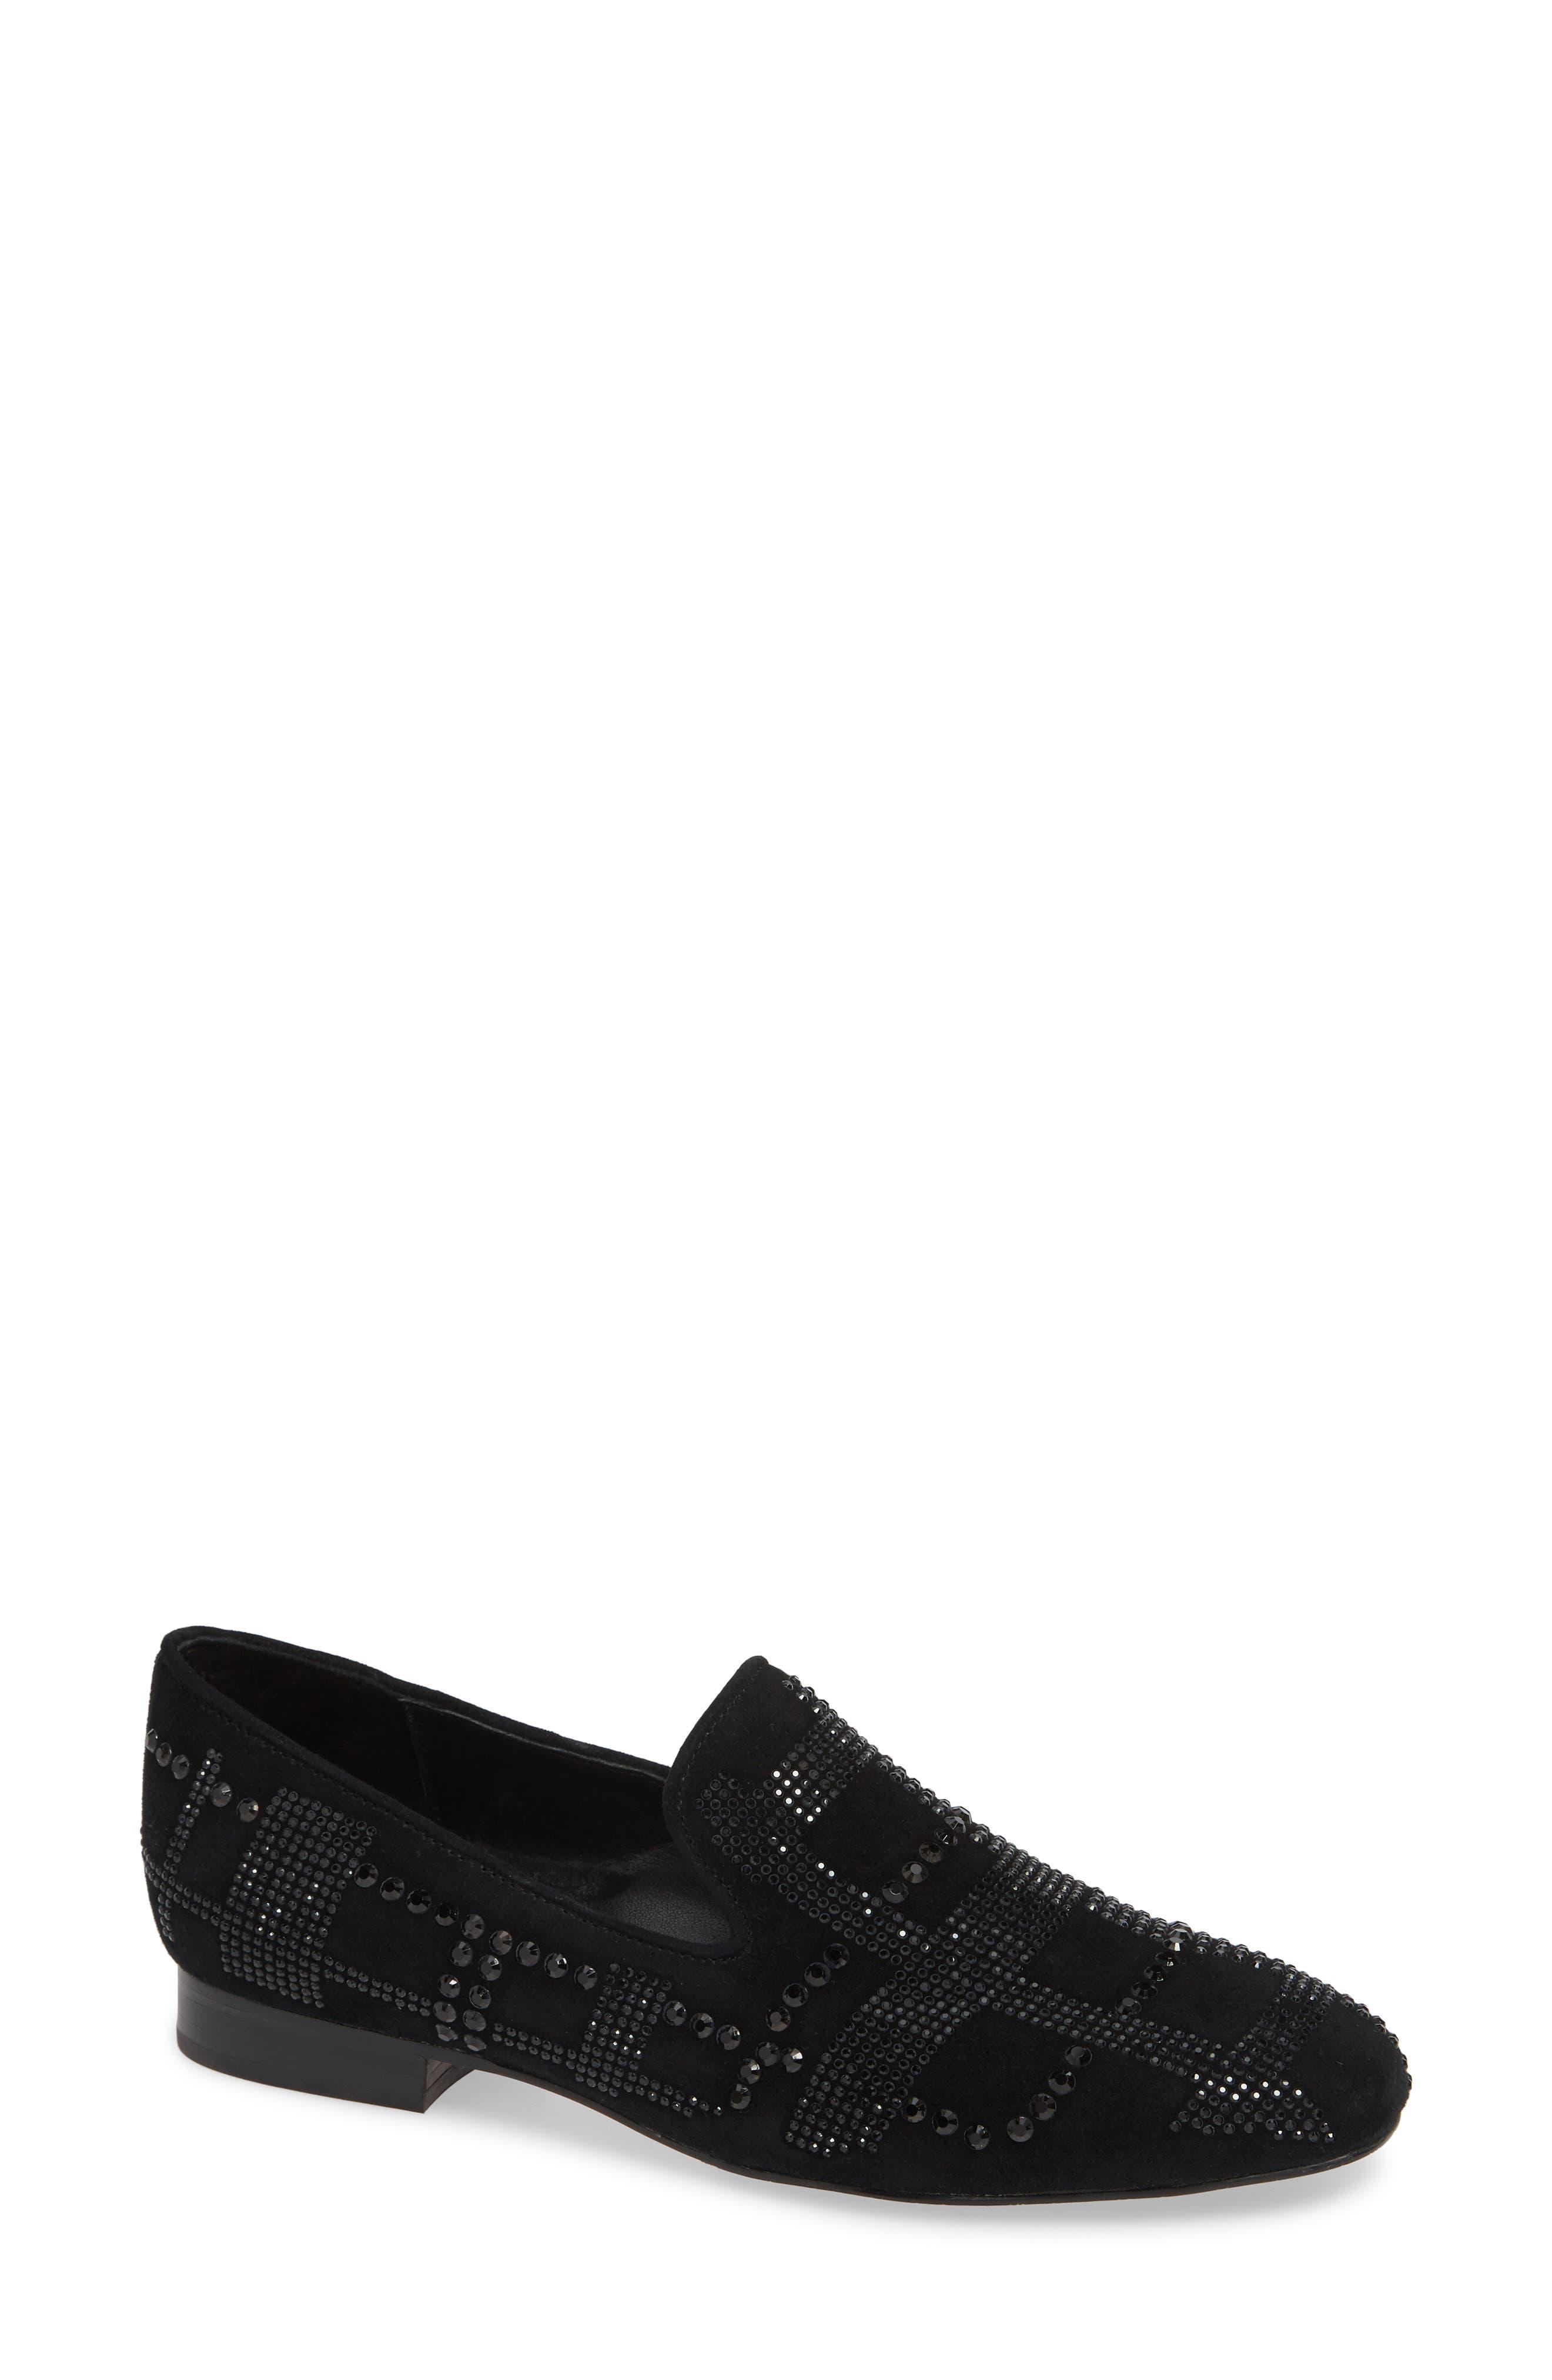 Libbi Rhinestone Suede Flat Loafers in Black